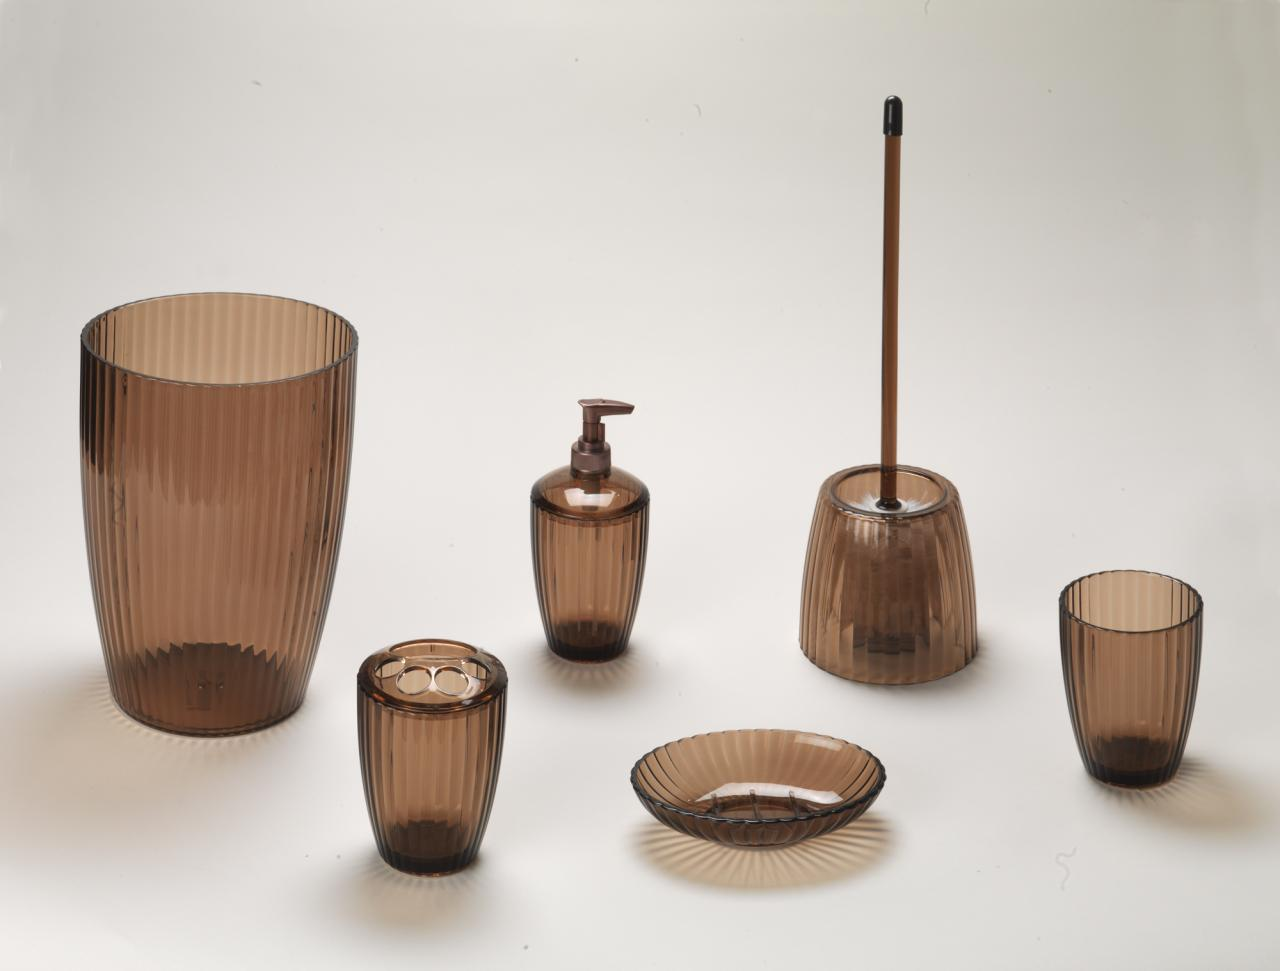 Carnation home fashions inc acrylic bath accessories for Brown bath accessories